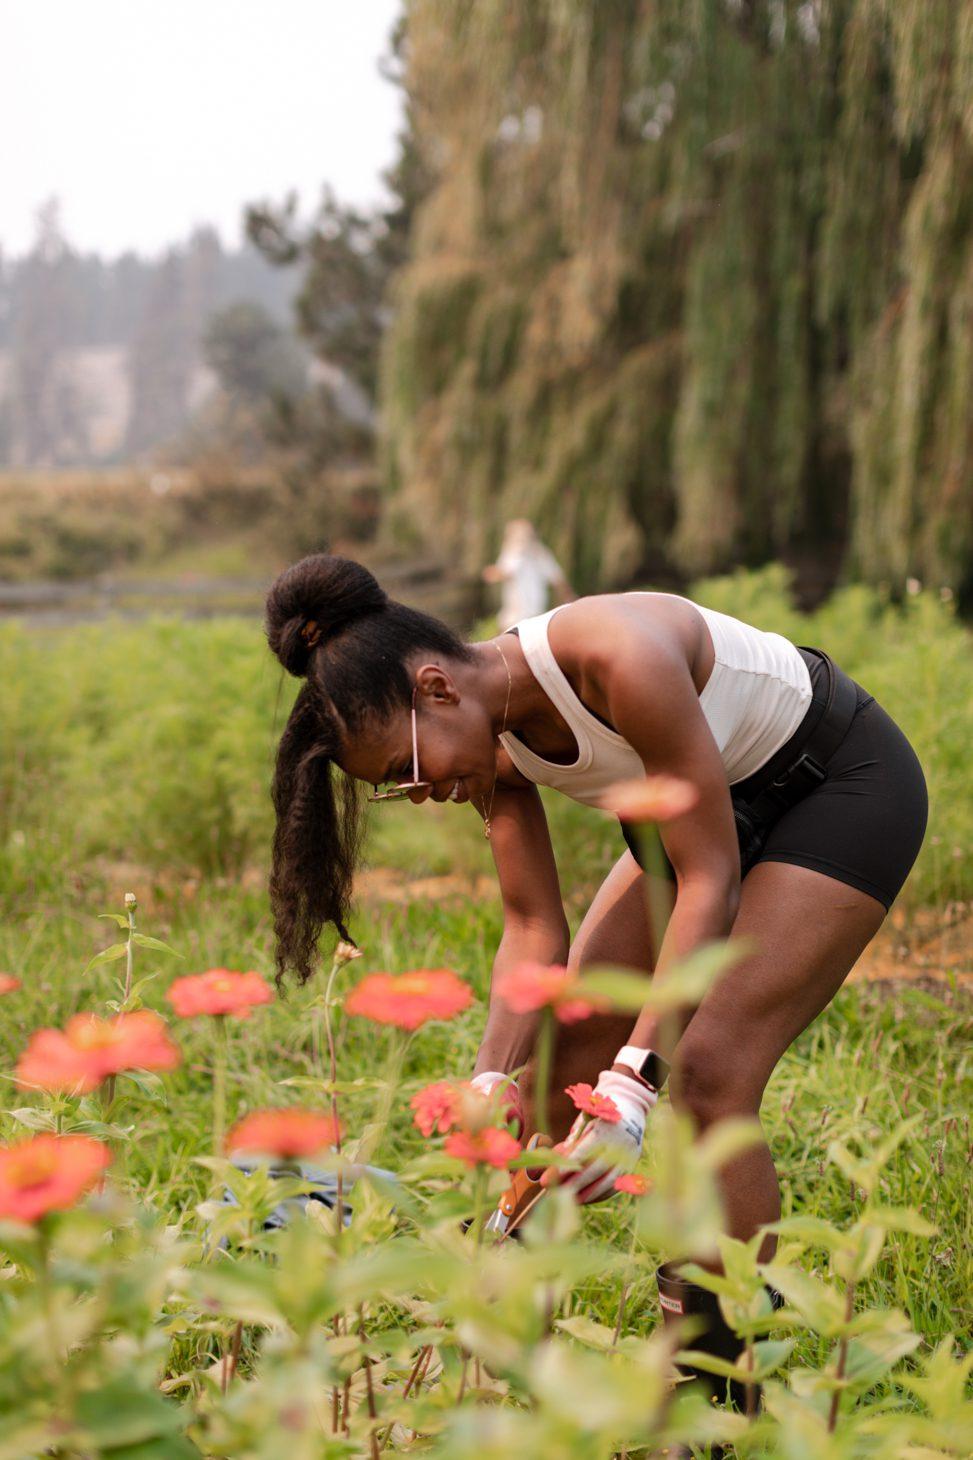 Team Jilly Harvesting Flowers for The Flower Event